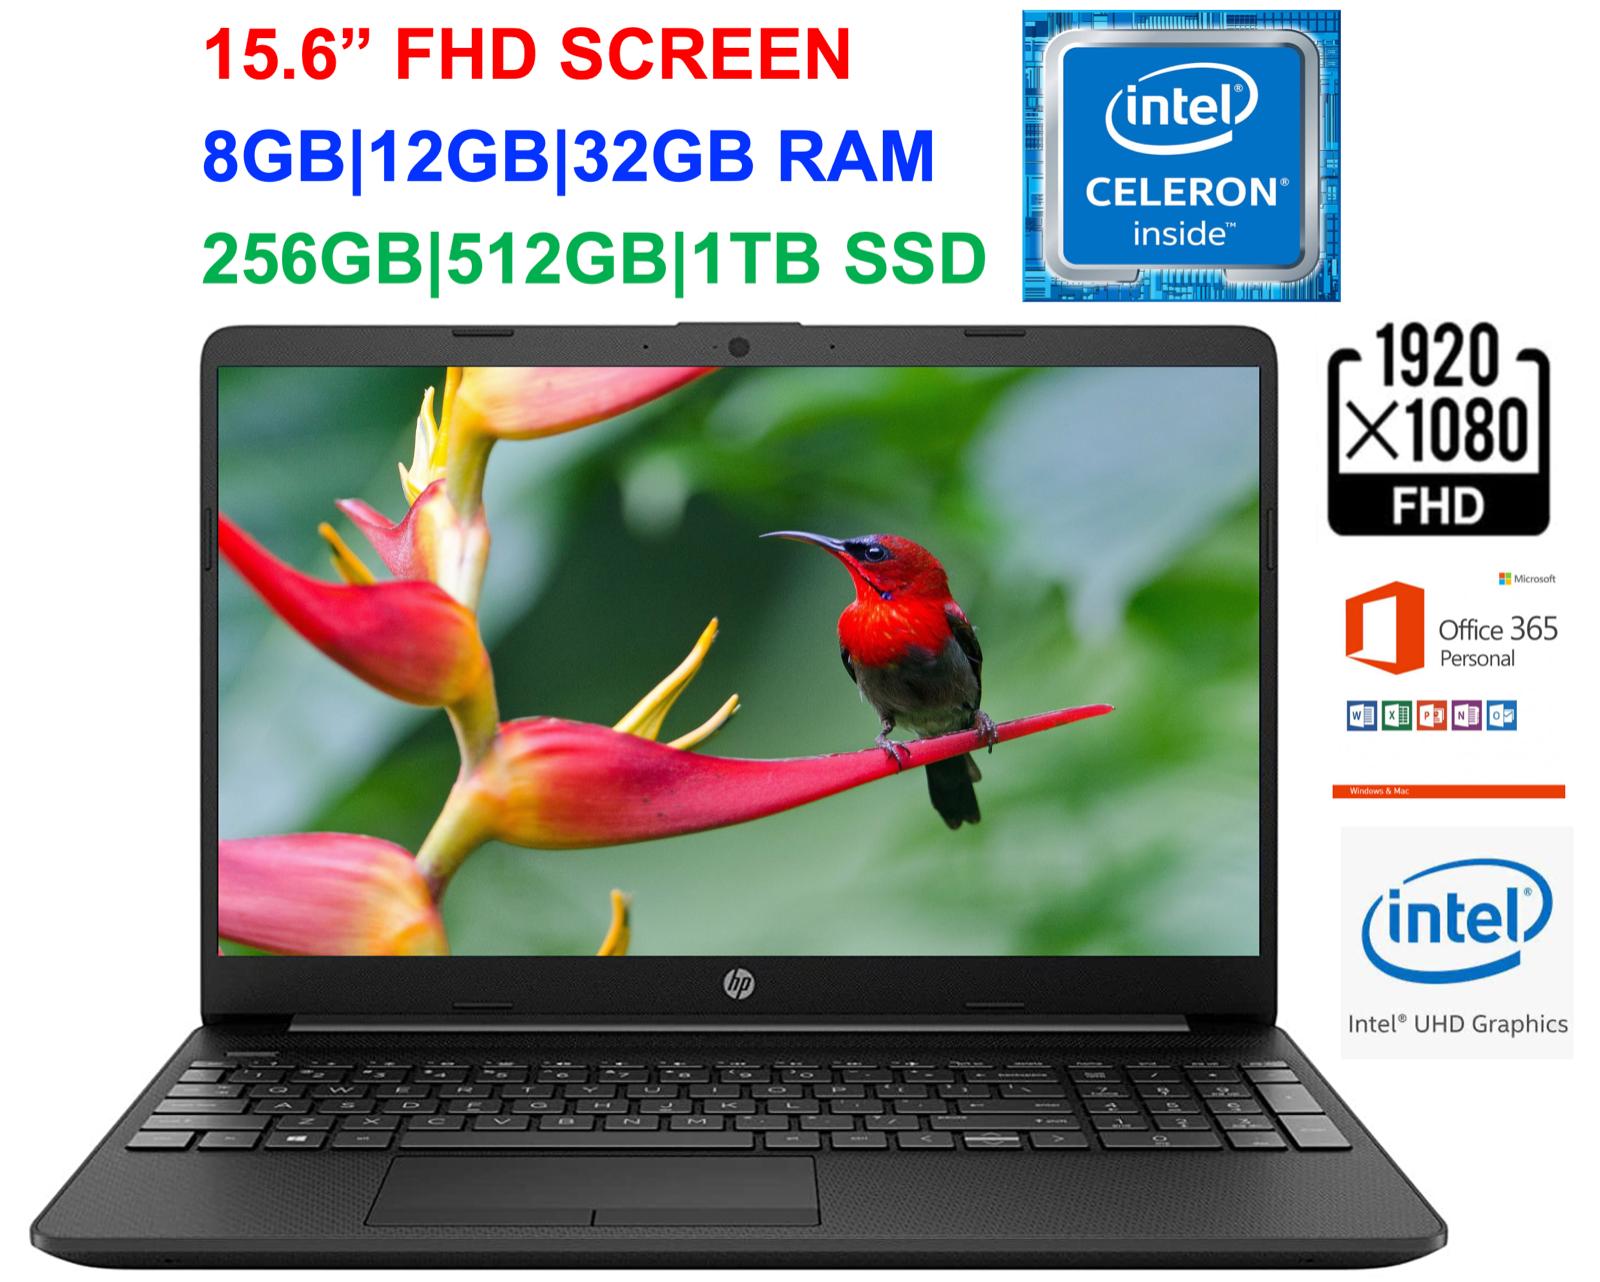 "2021 HP 15.6"" FHD Laptop Intel Celeron N4020, Up to 2.8GHz,16GB RAM &1TB SSD"